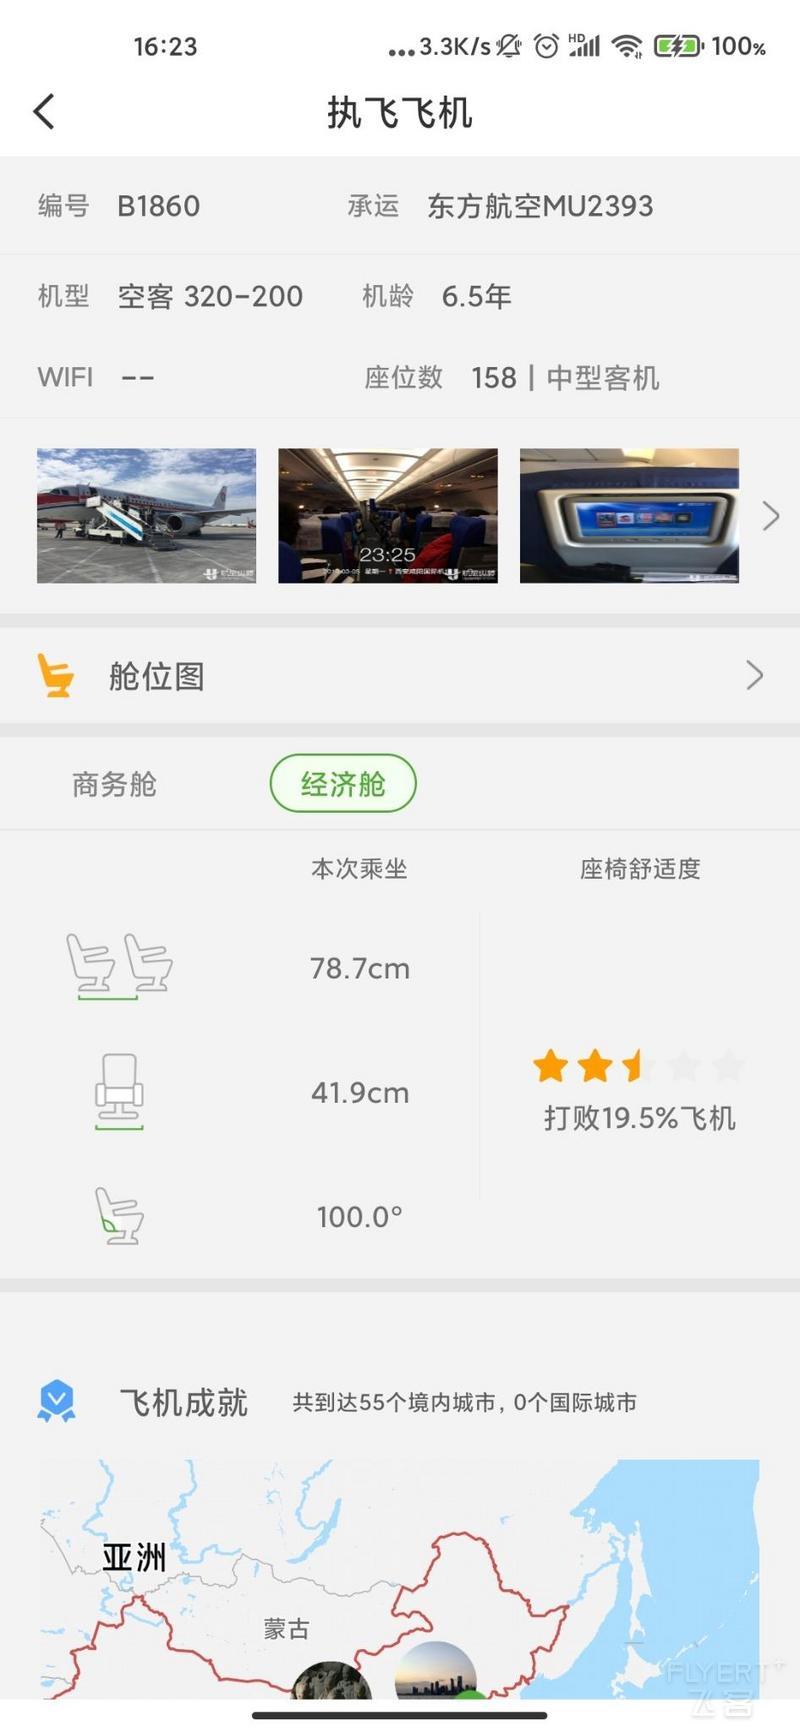 Screenshot_2021-02-26-16-23-16-967_com.umetrip.android.msky.app.jpg